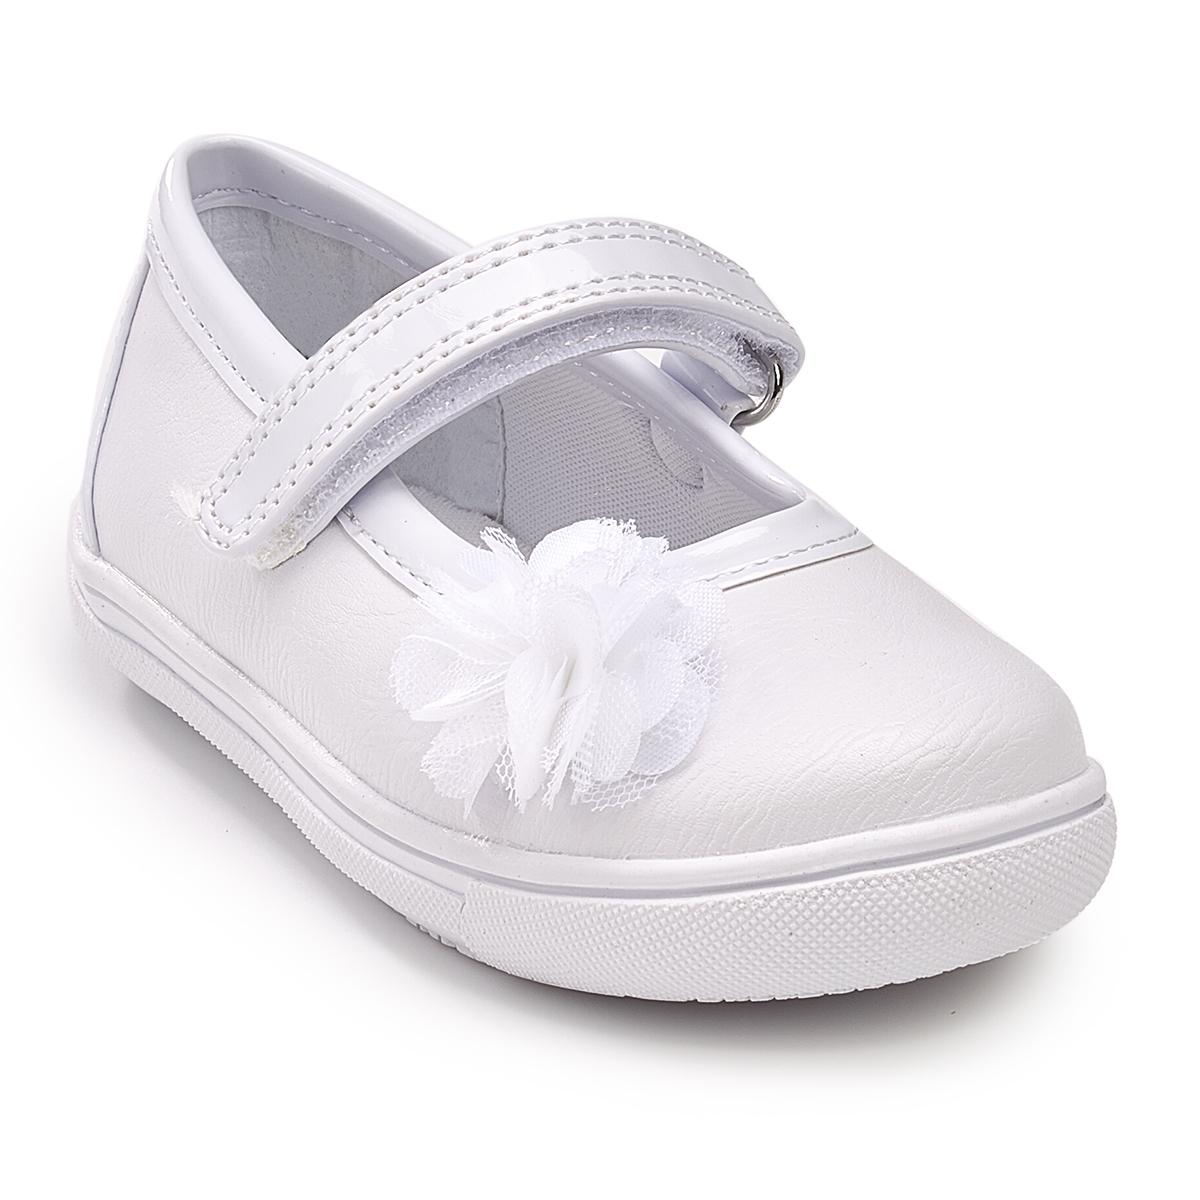 Rachel Shoes Toddler Girls' Giovanna Flower Mary Jane Flats - White, 10